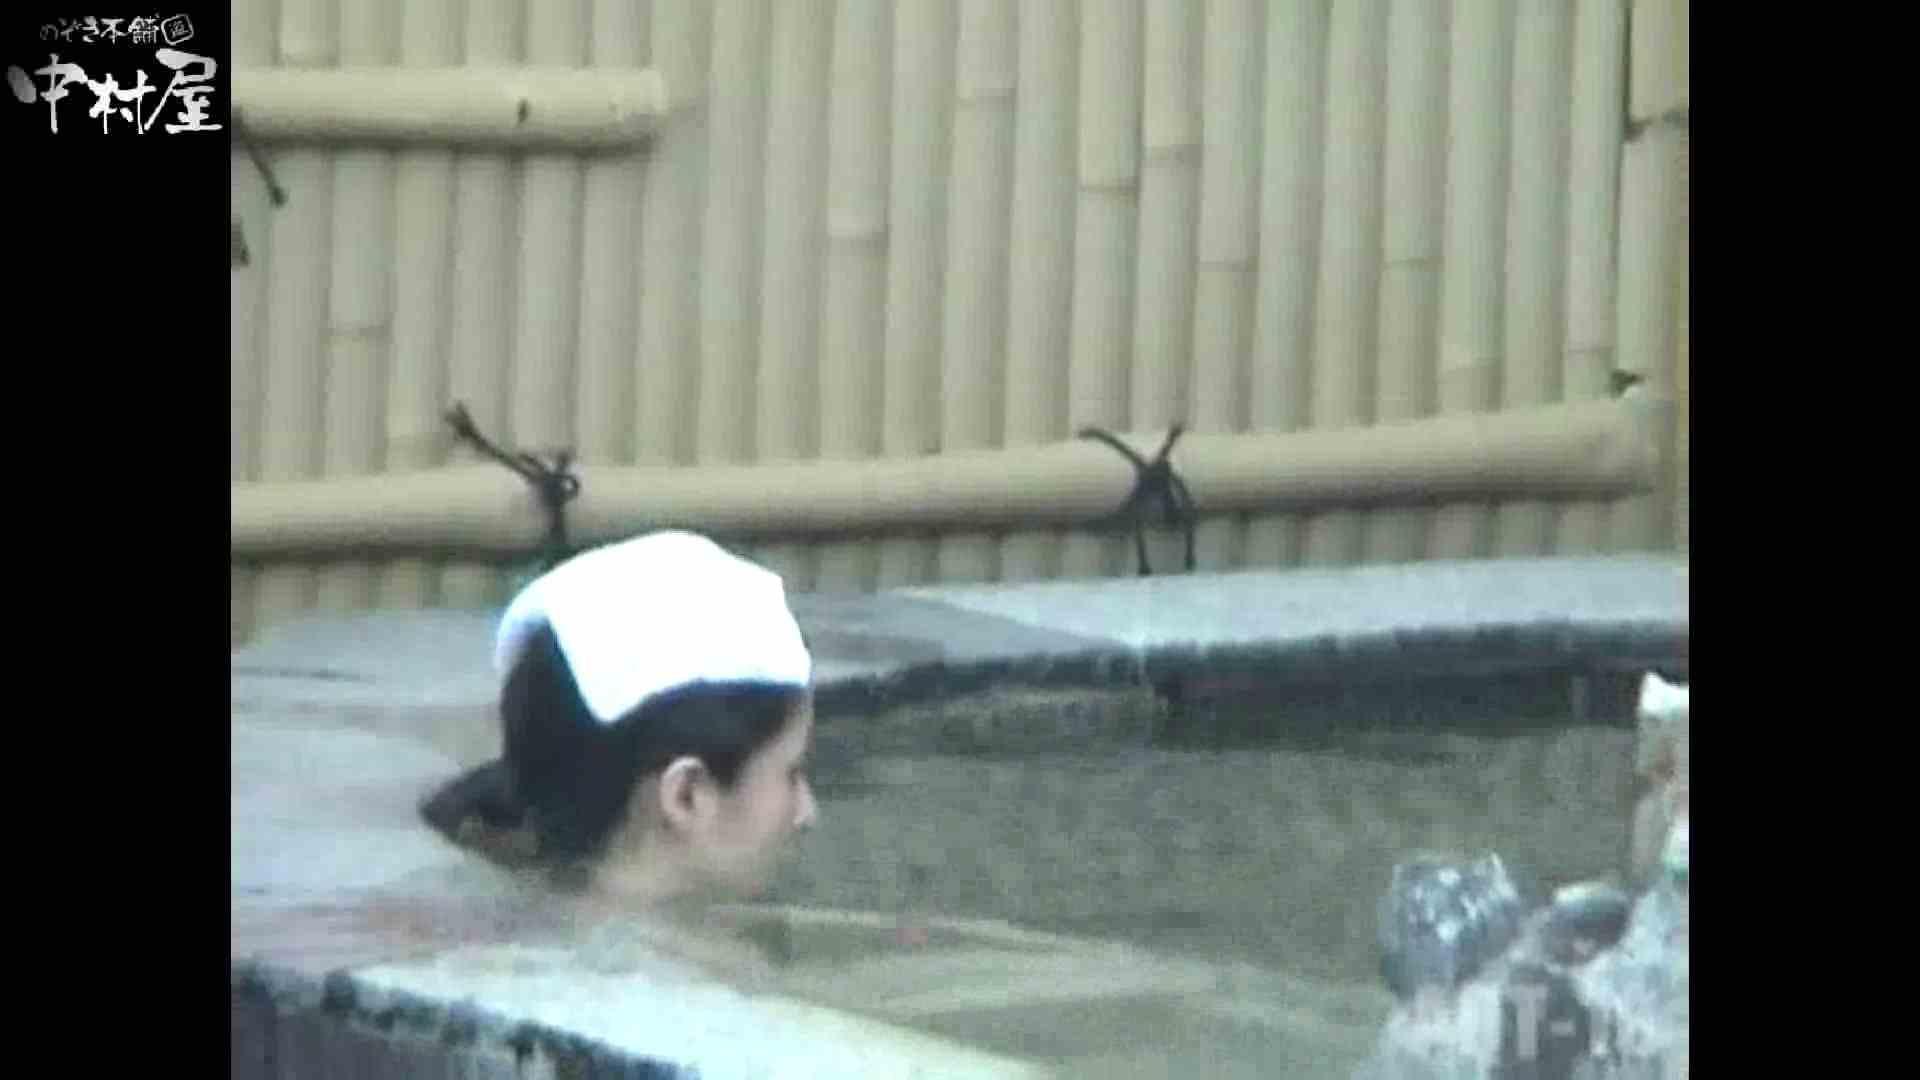 Aquaな露天風呂Vol.880潜入盗撮露天風呂十六判湯 其の六 盗撮 SEX無修正画像 47連発 15